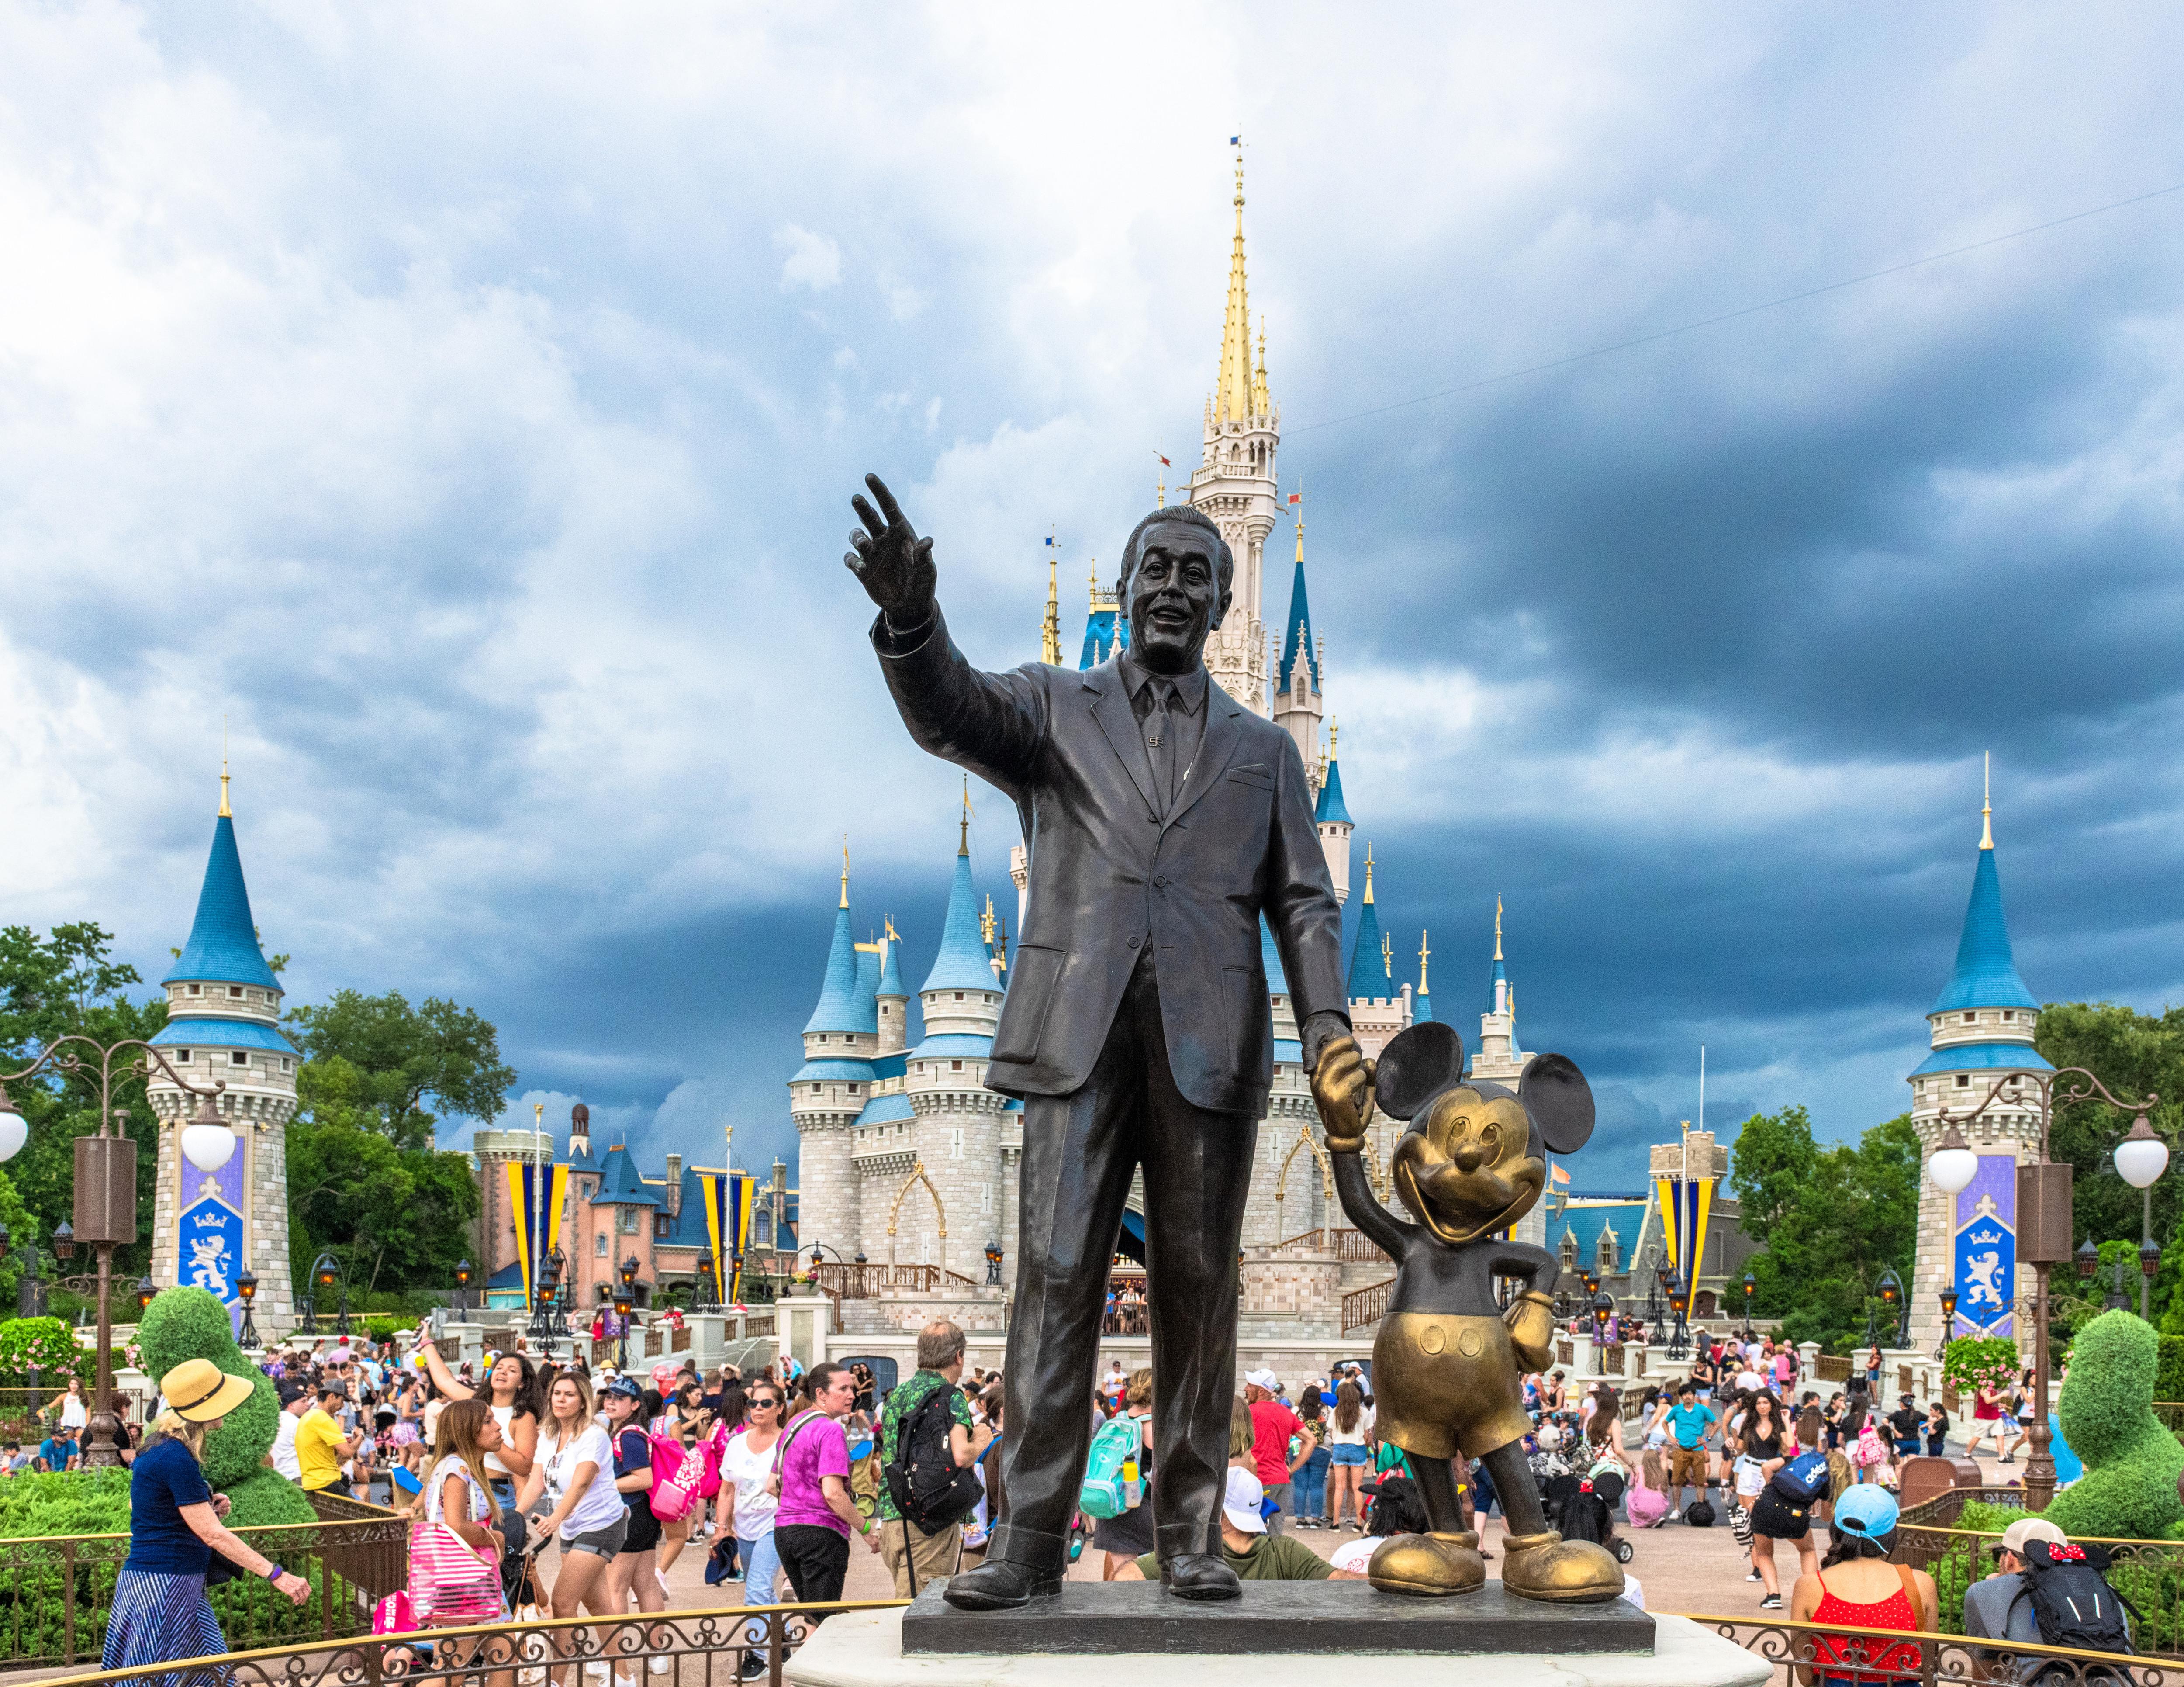 walt and mickey statue in disney world's magic kingdom